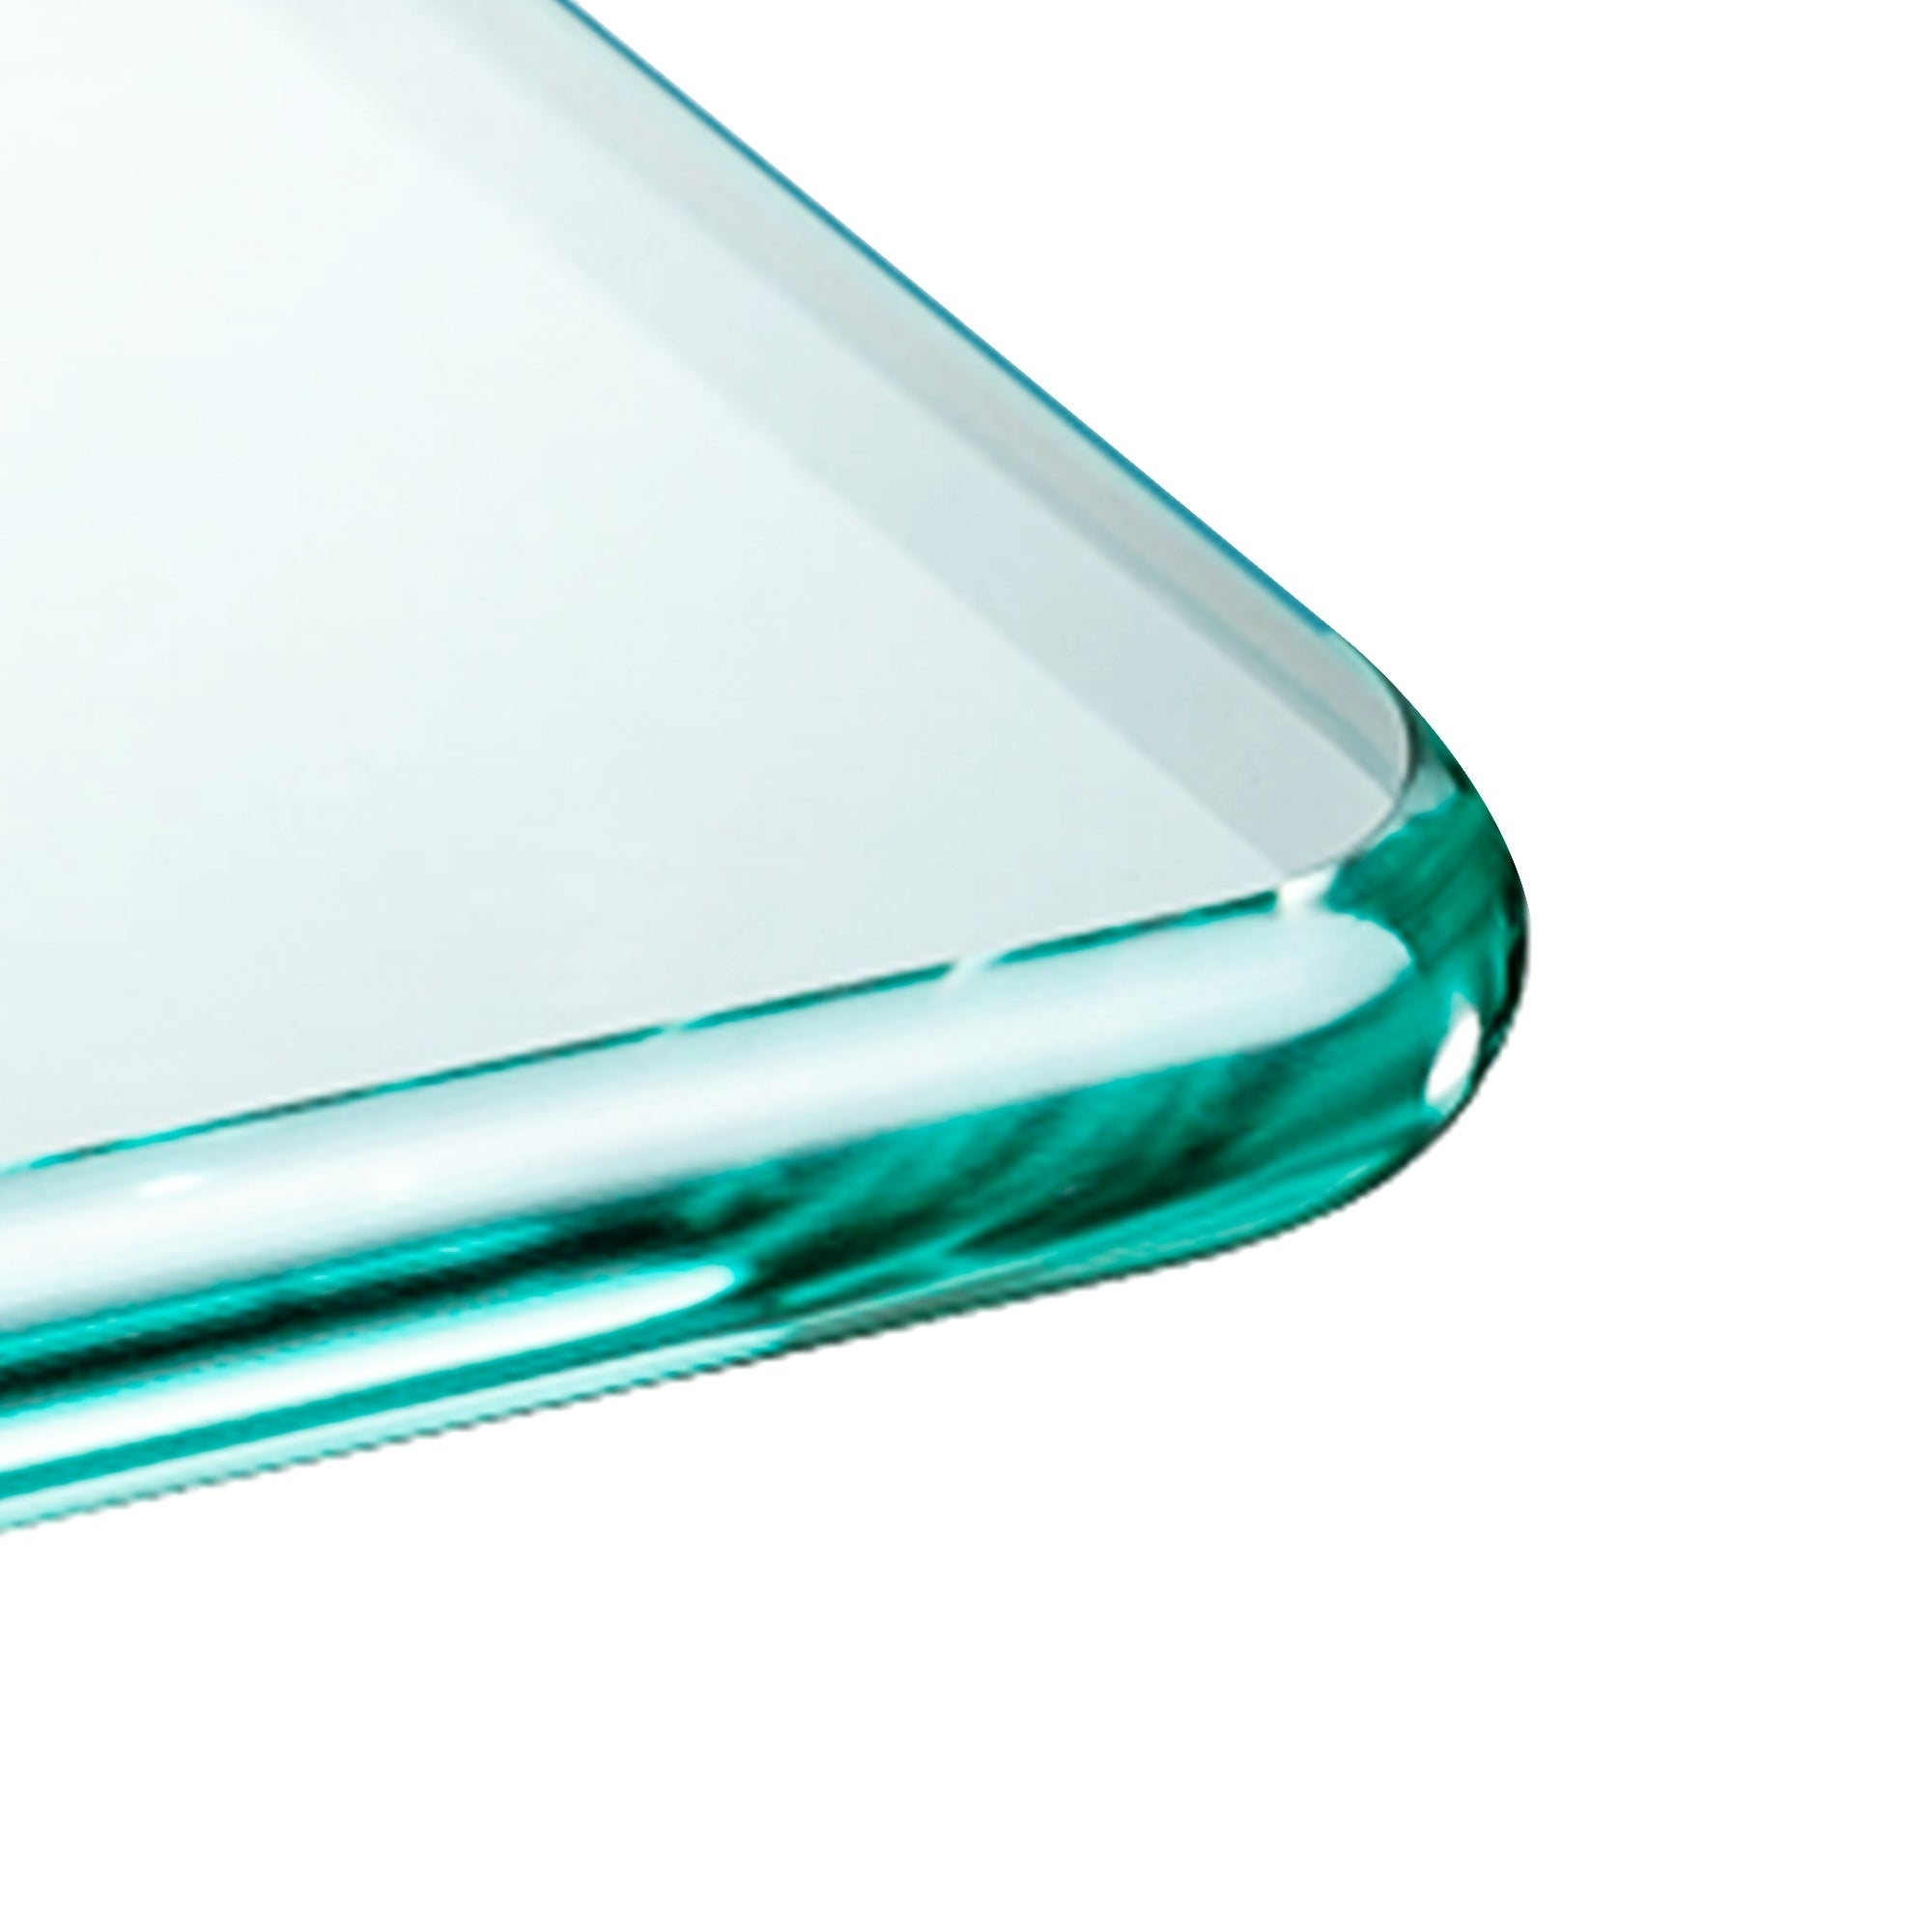 7e2529eec87f Shop Rectangle Glass Table Top 3/8